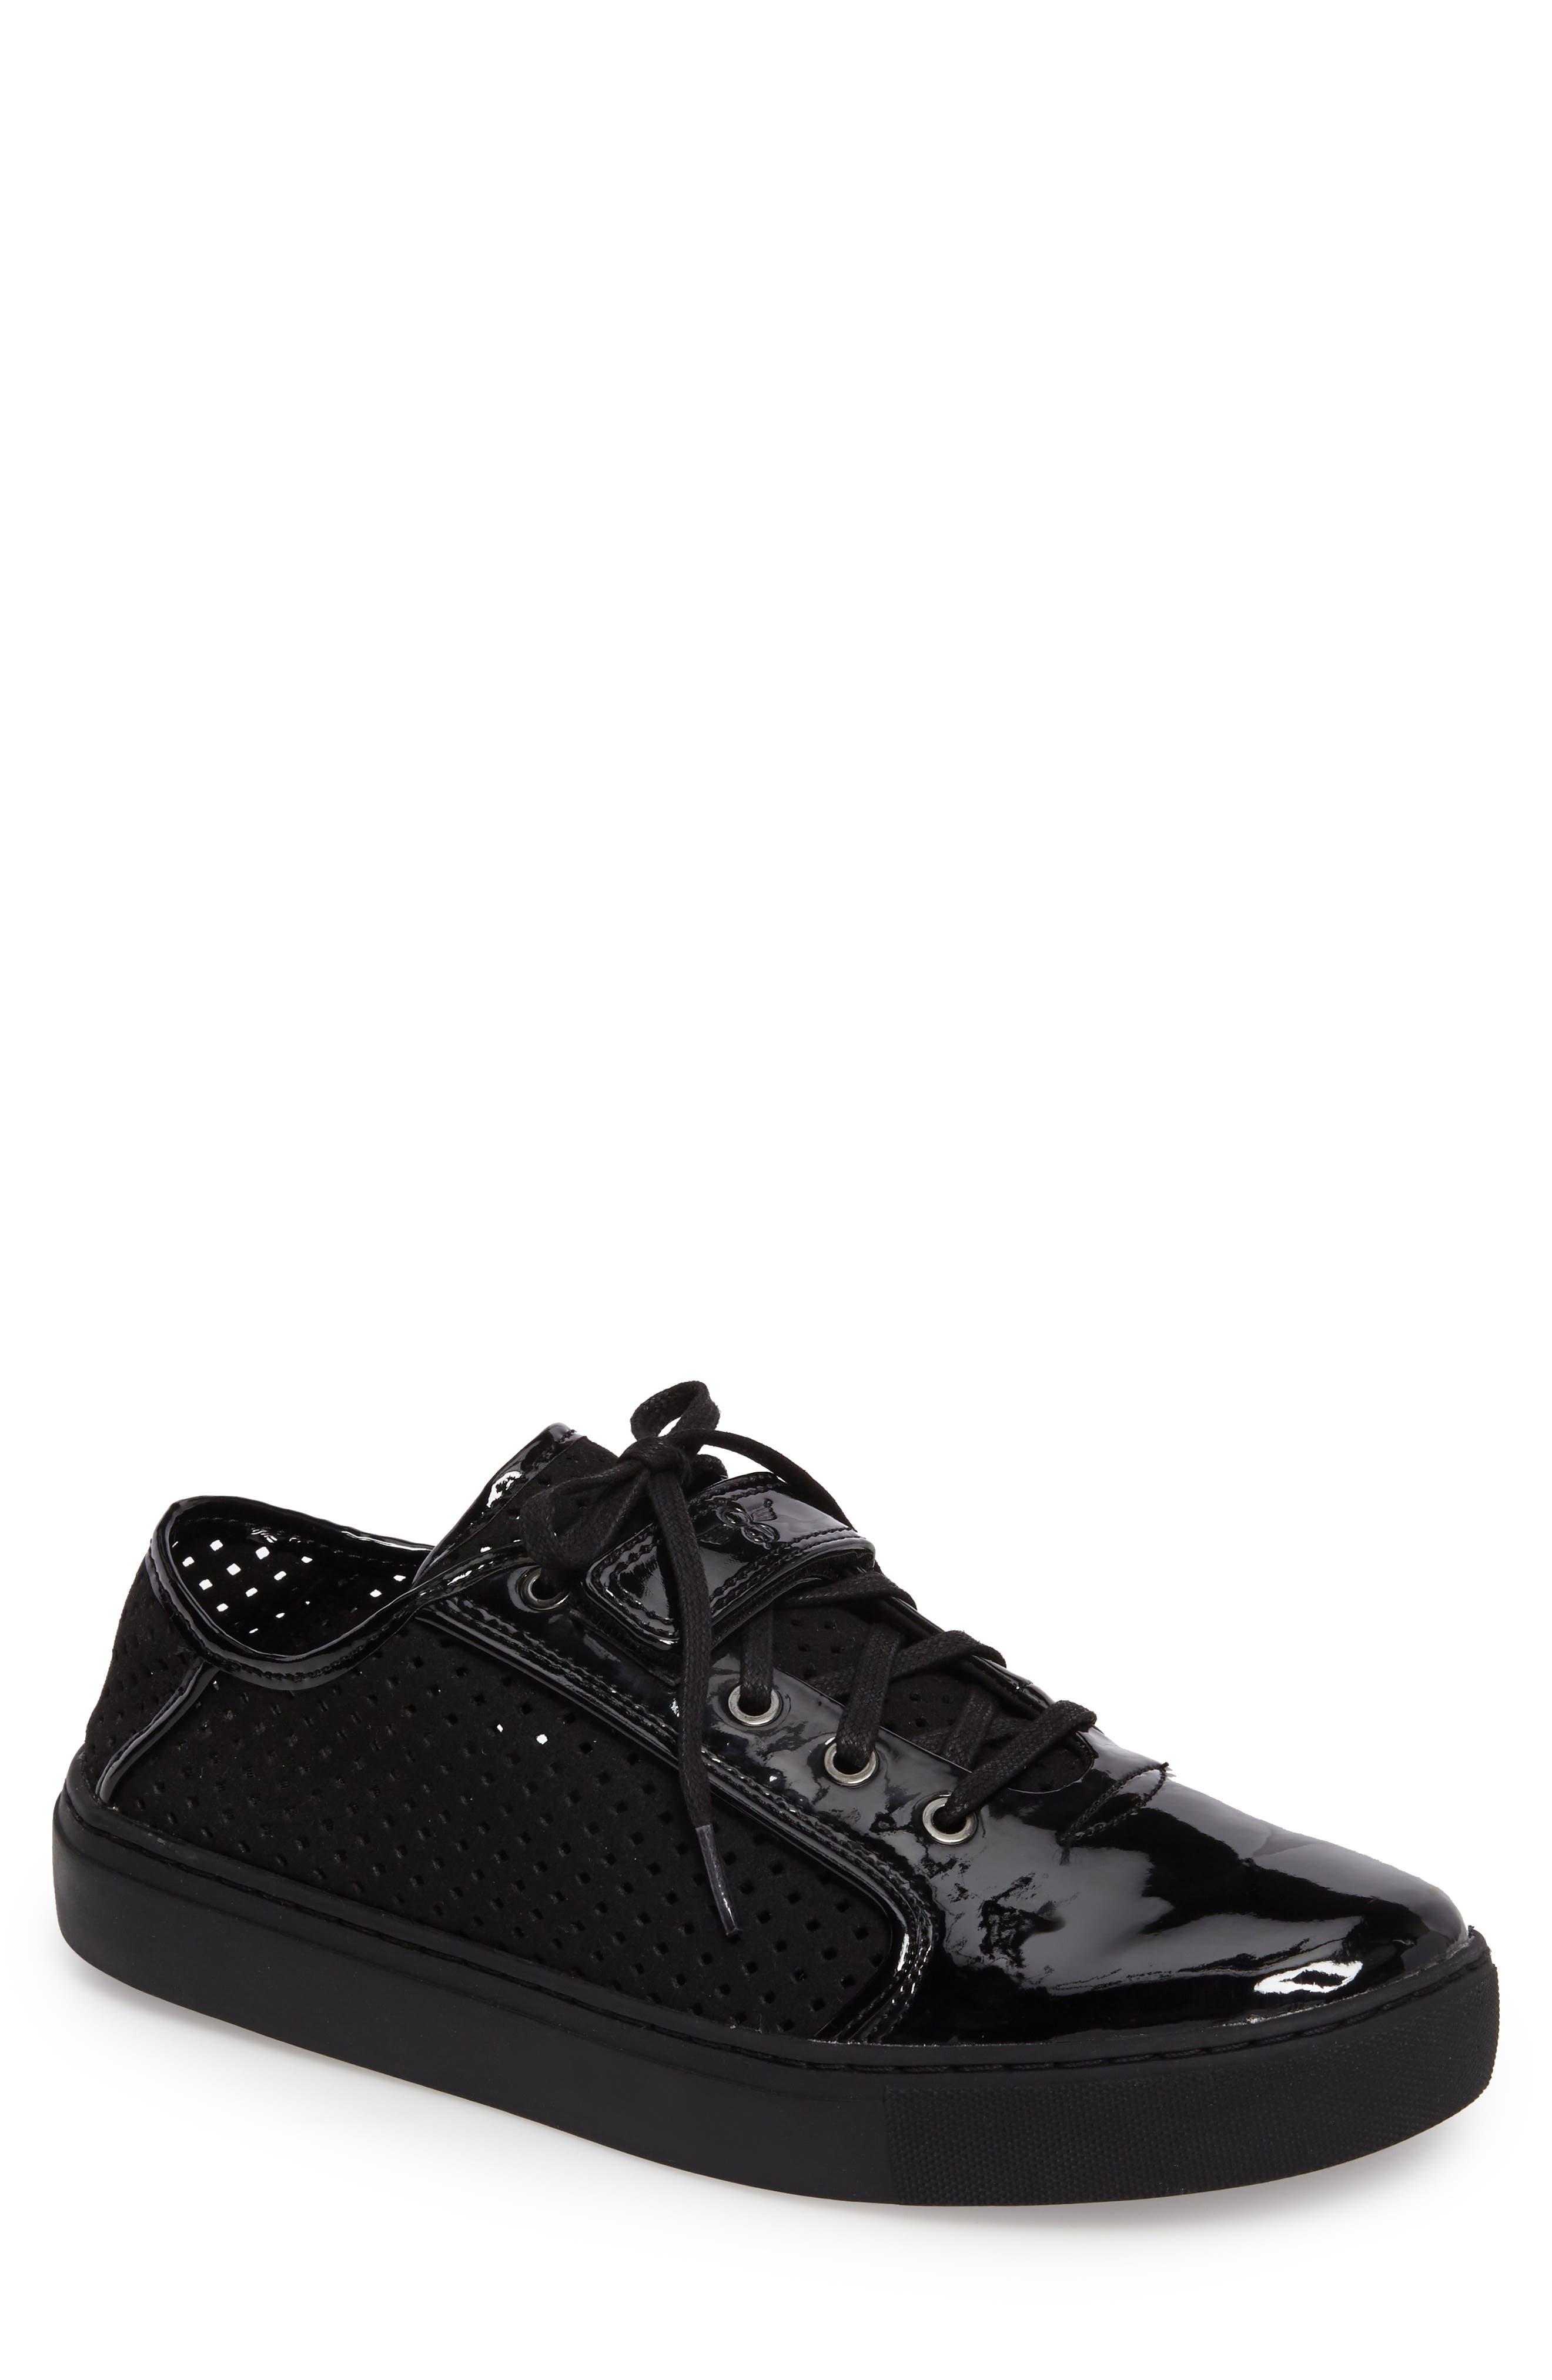 Pagno Sneaker,                             Main thumbnail 1, color,                             001